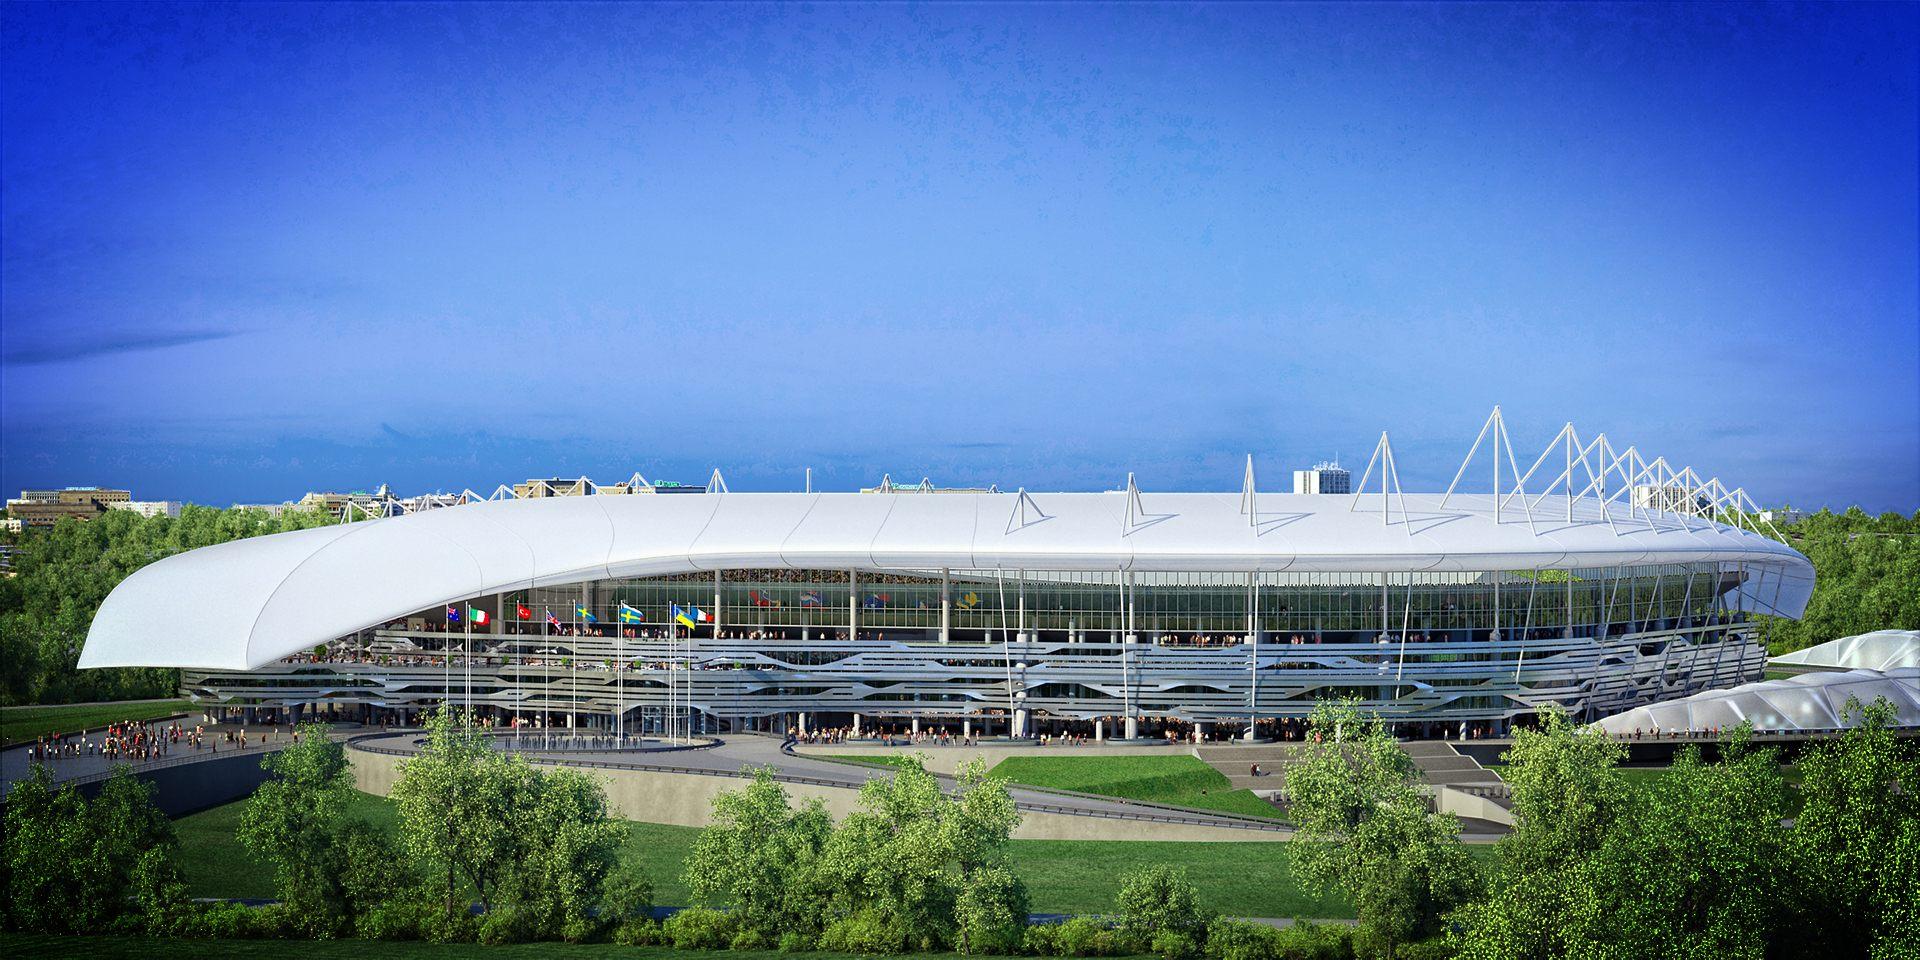 Design: Stadion Rostov – StadiumDB com